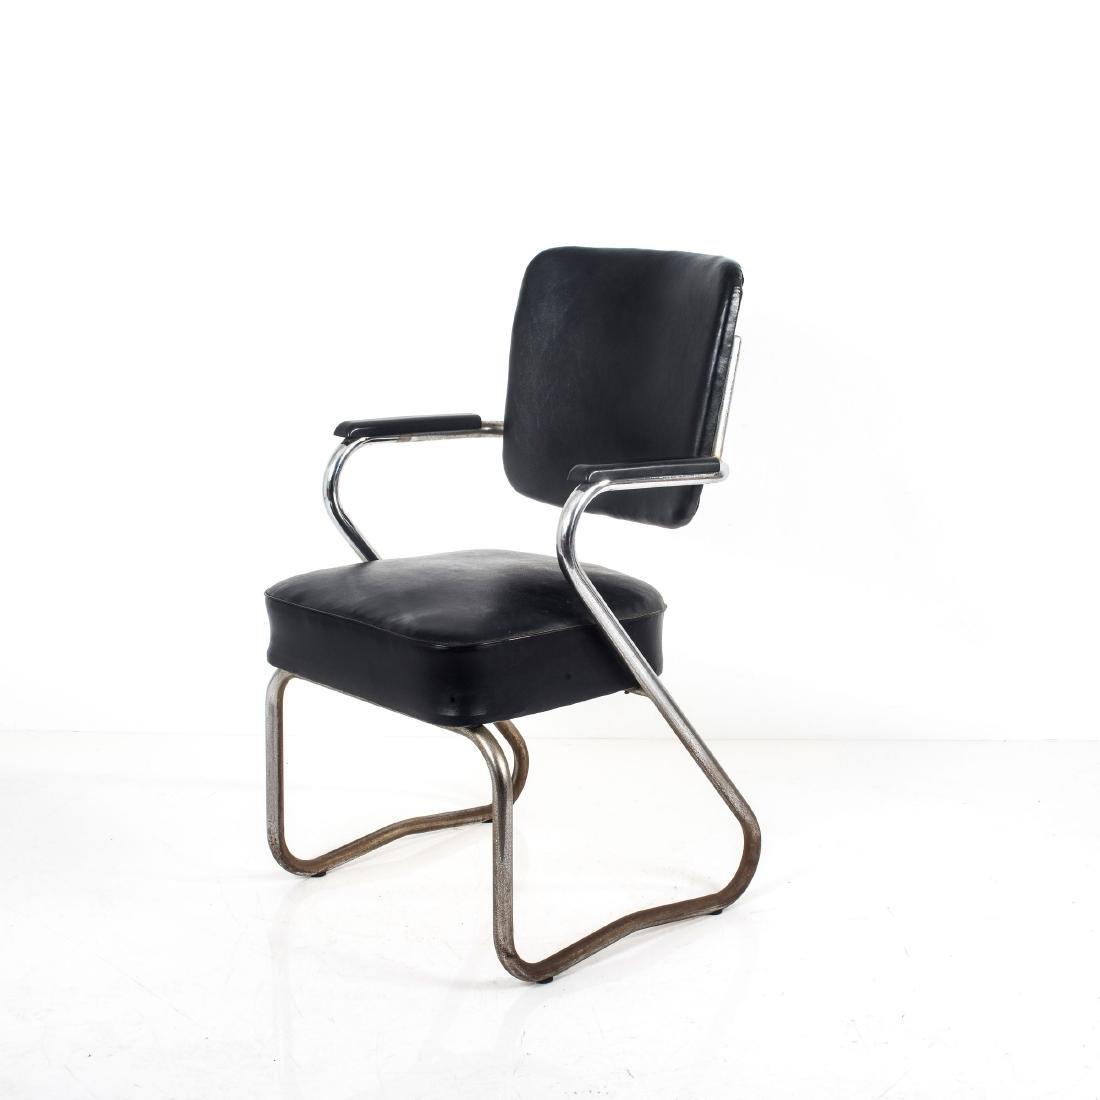 Tubular steel chair, c. 1935 - 3